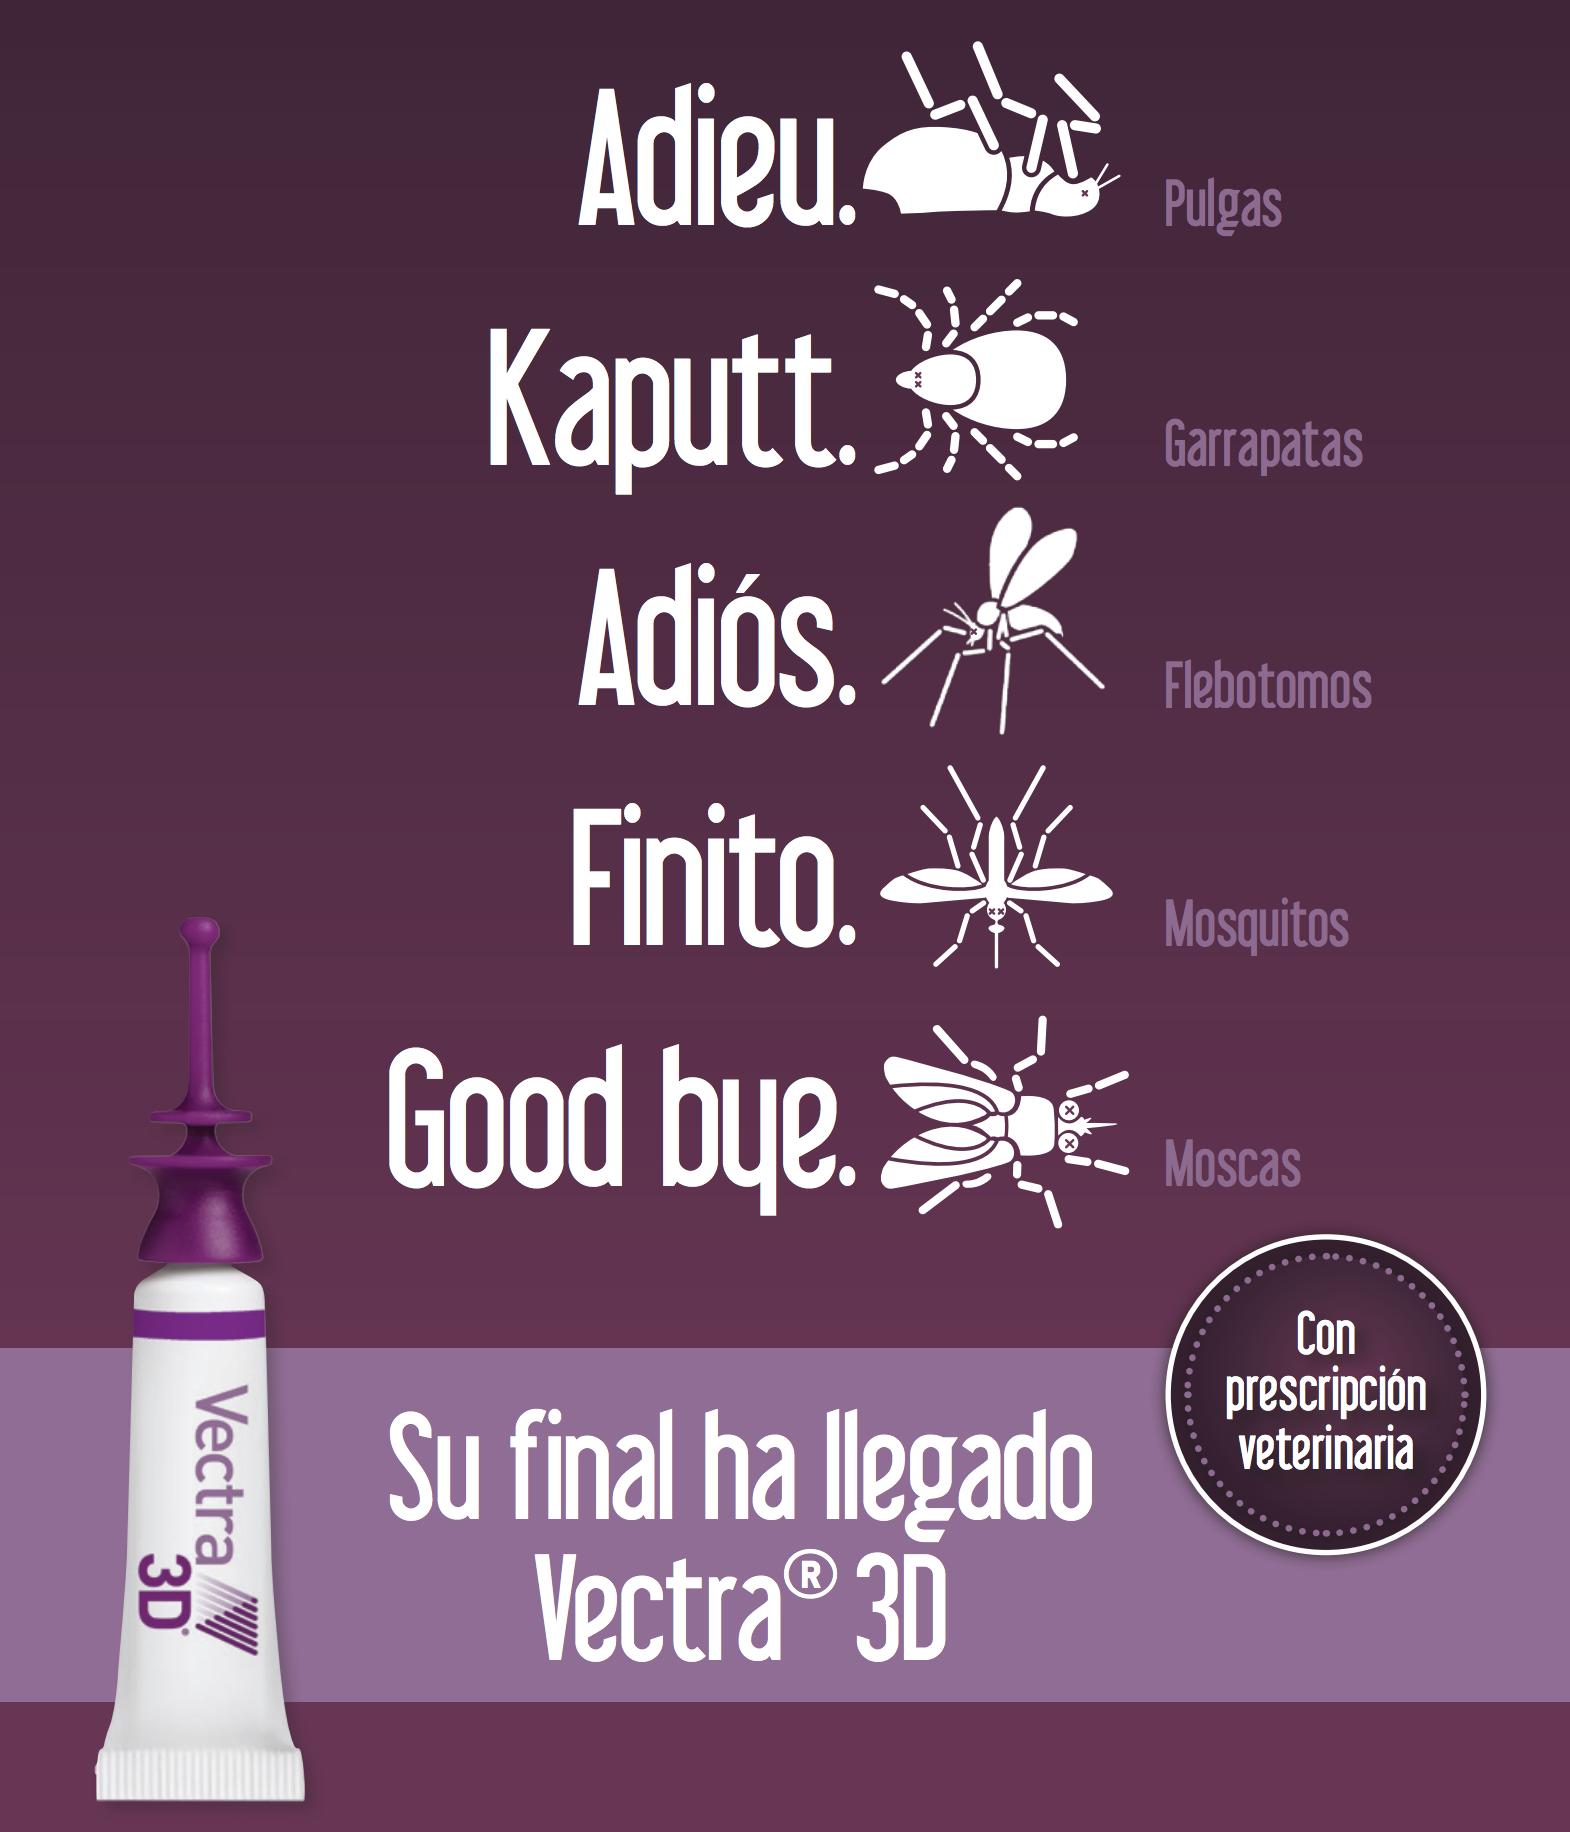 vectra 3d veterinaria